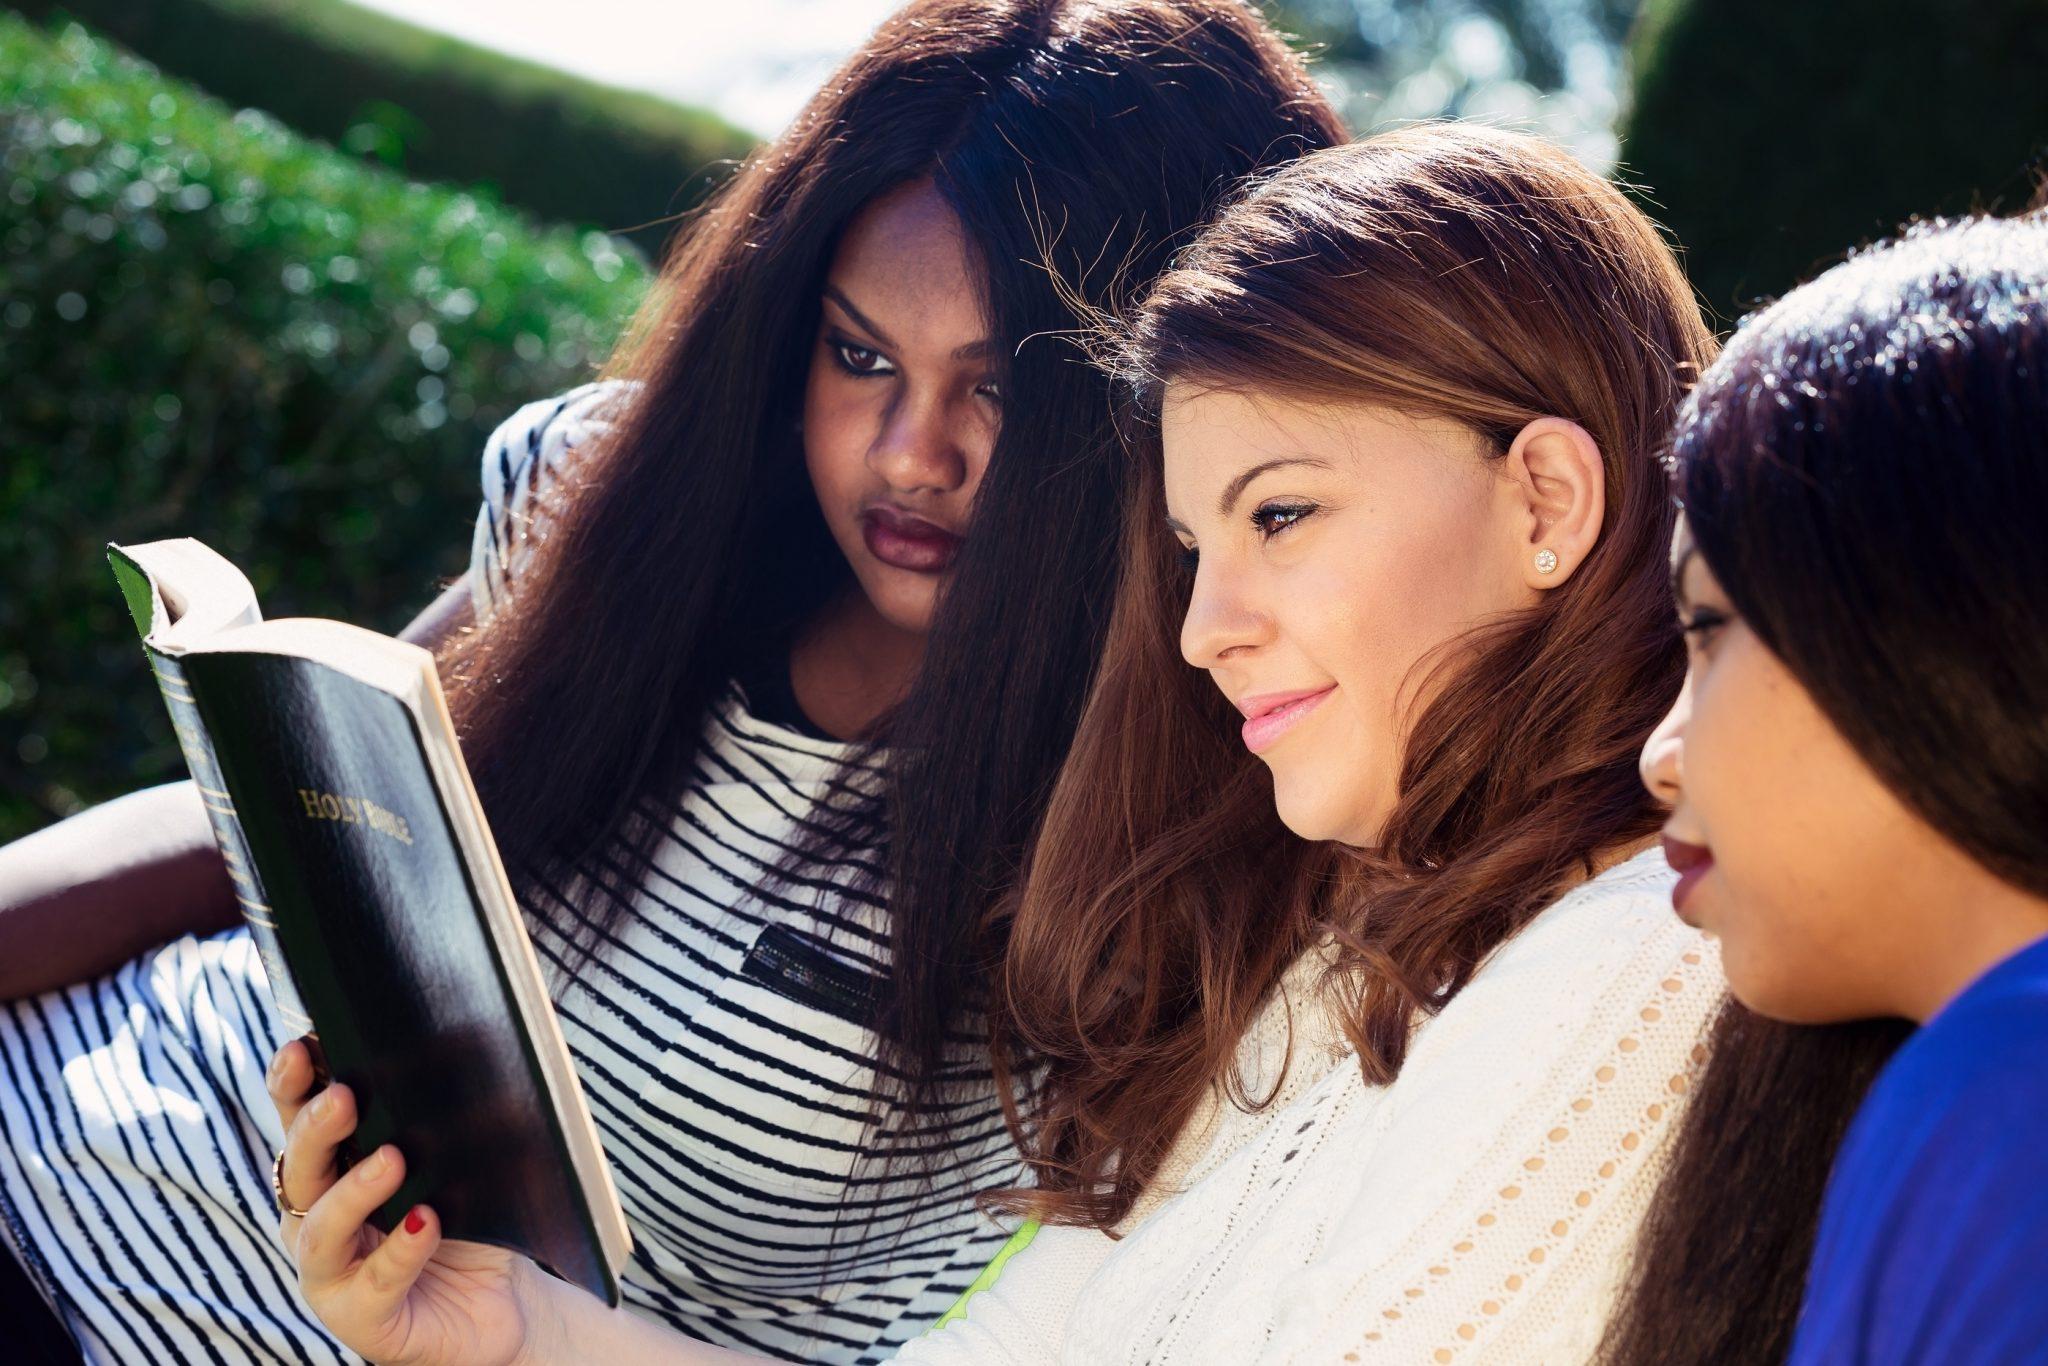 bigstock-Three-Girls-Studying-The-Bible-70361500